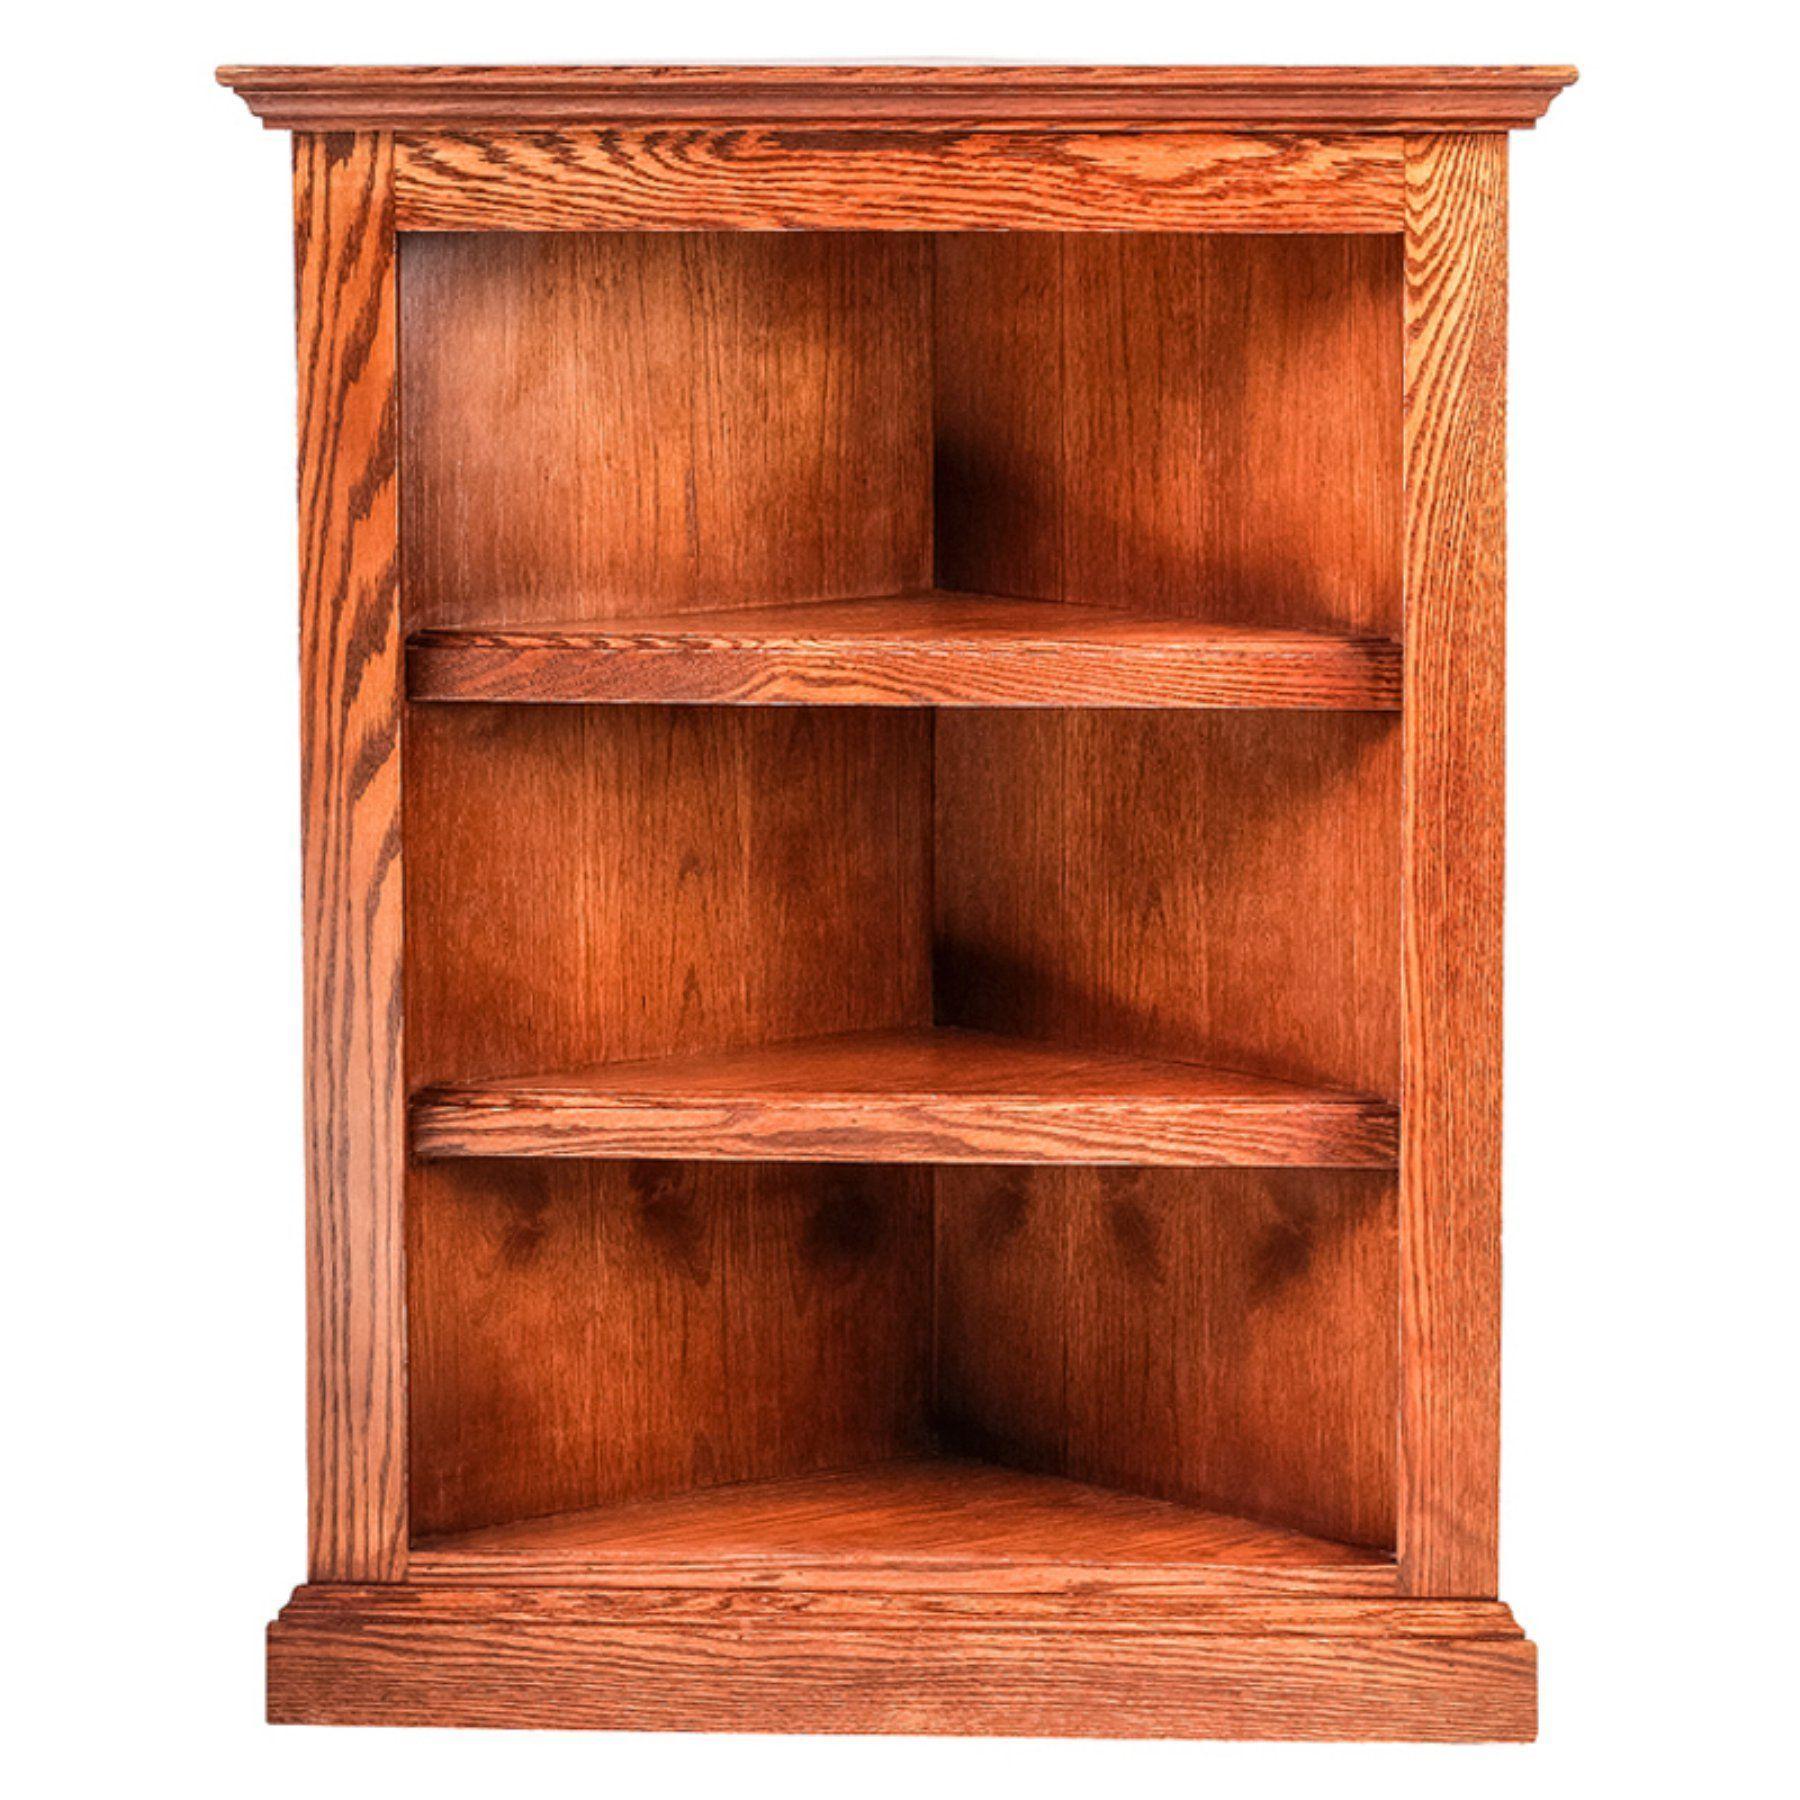 Forest Designs Traditional Oak Corner Bookcase - 6701- TR-30H-NA